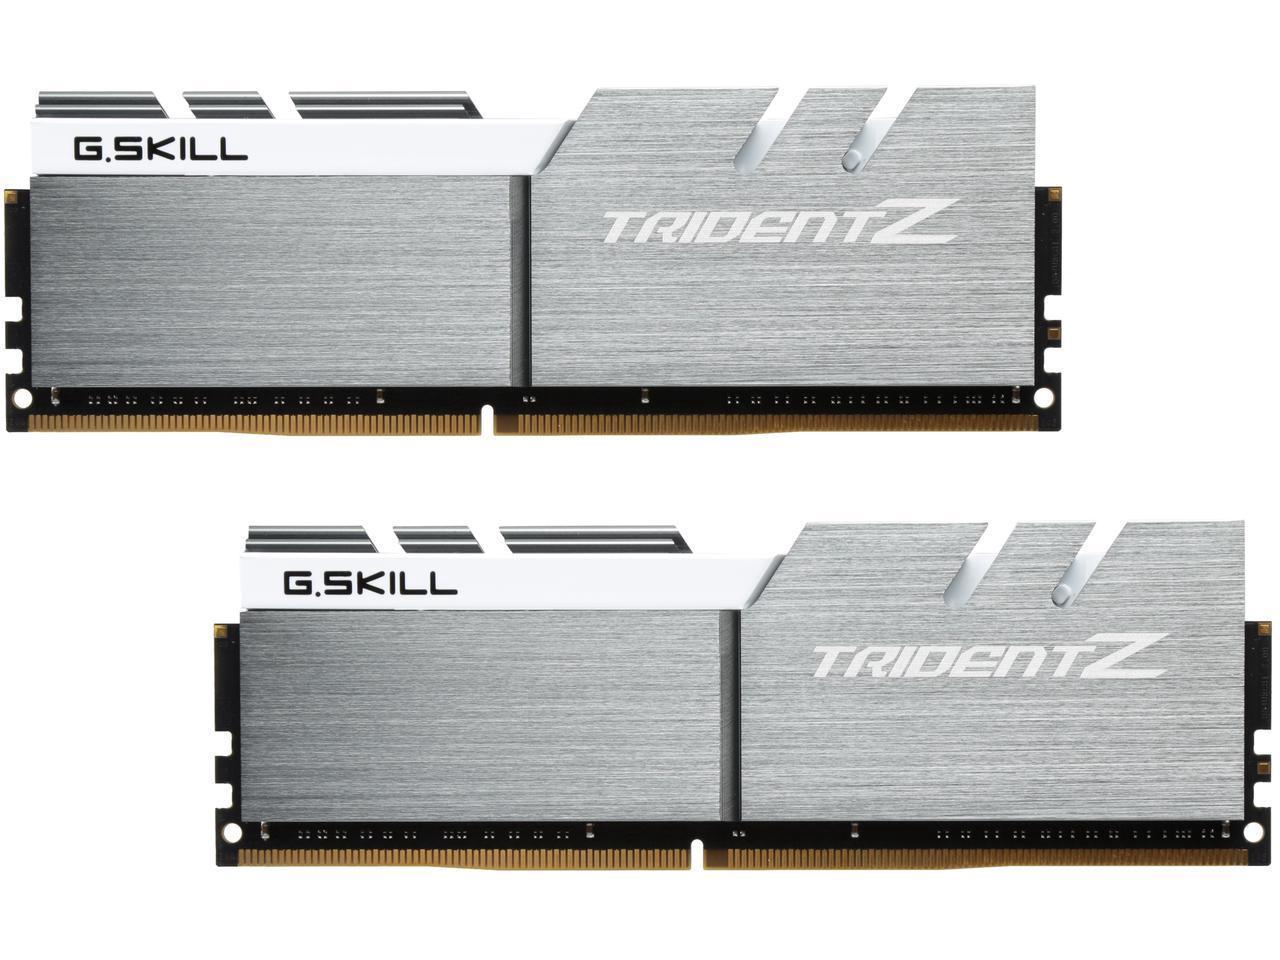 G.SKILL TridentZ Series 32GB (2 x 16GB) 288-Pin DDR4 3200 (PC4 25600) Desktop Memory $300 + Free Shipping